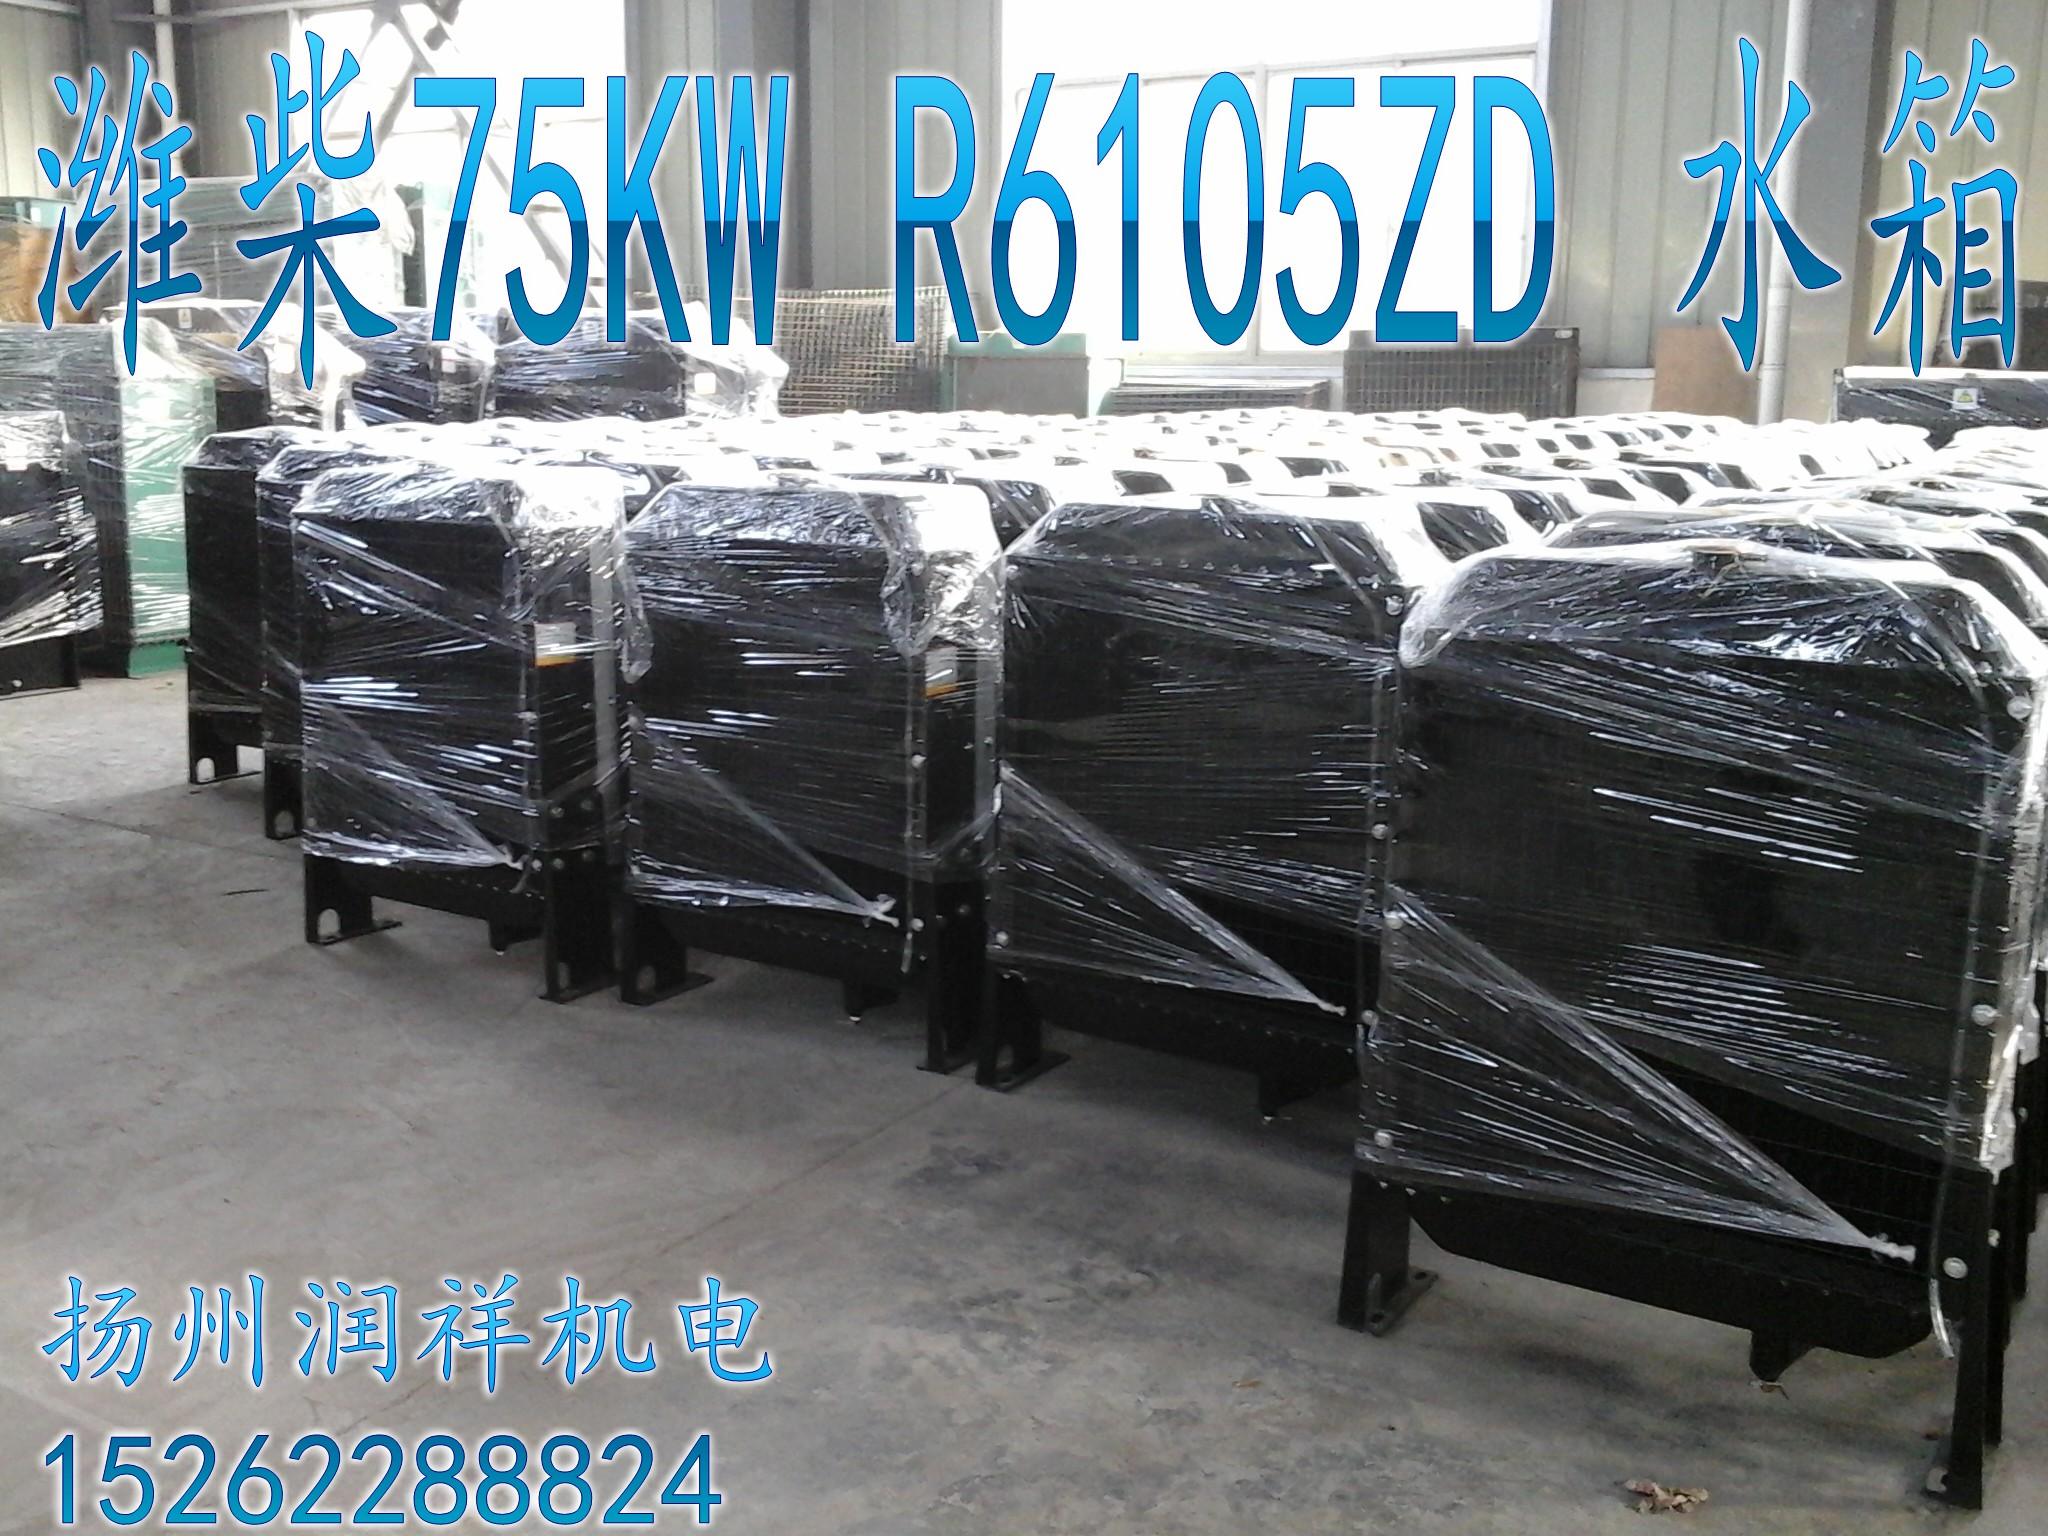 USD 262 86] Weichai 75KW tank R6105ZD 75KW Weichai sel